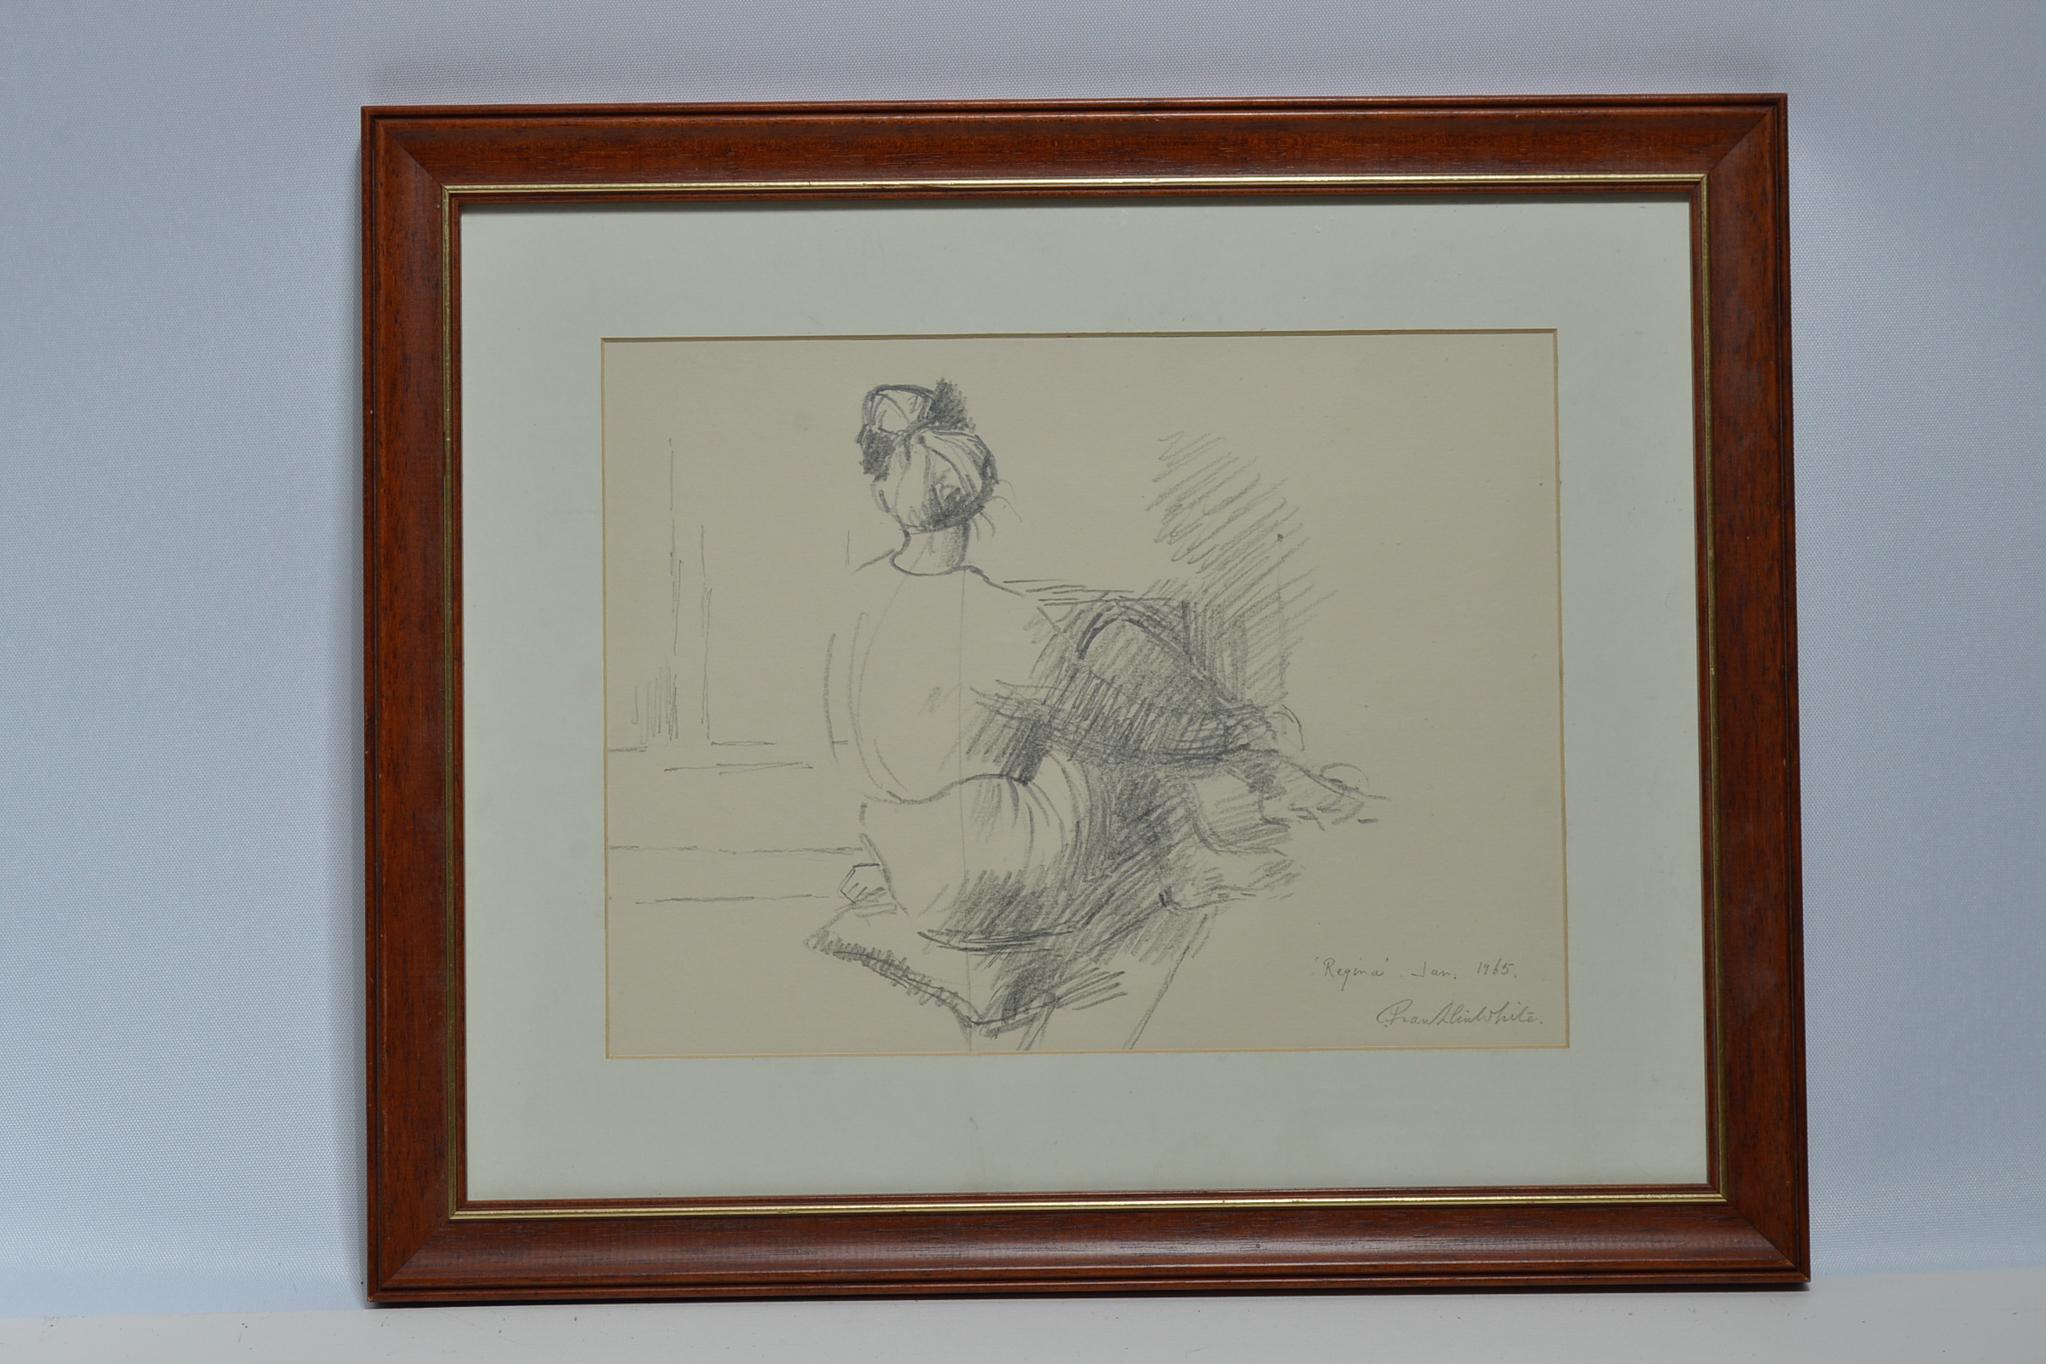 Lot 32 - Original signed pencil sketch by Franklin White